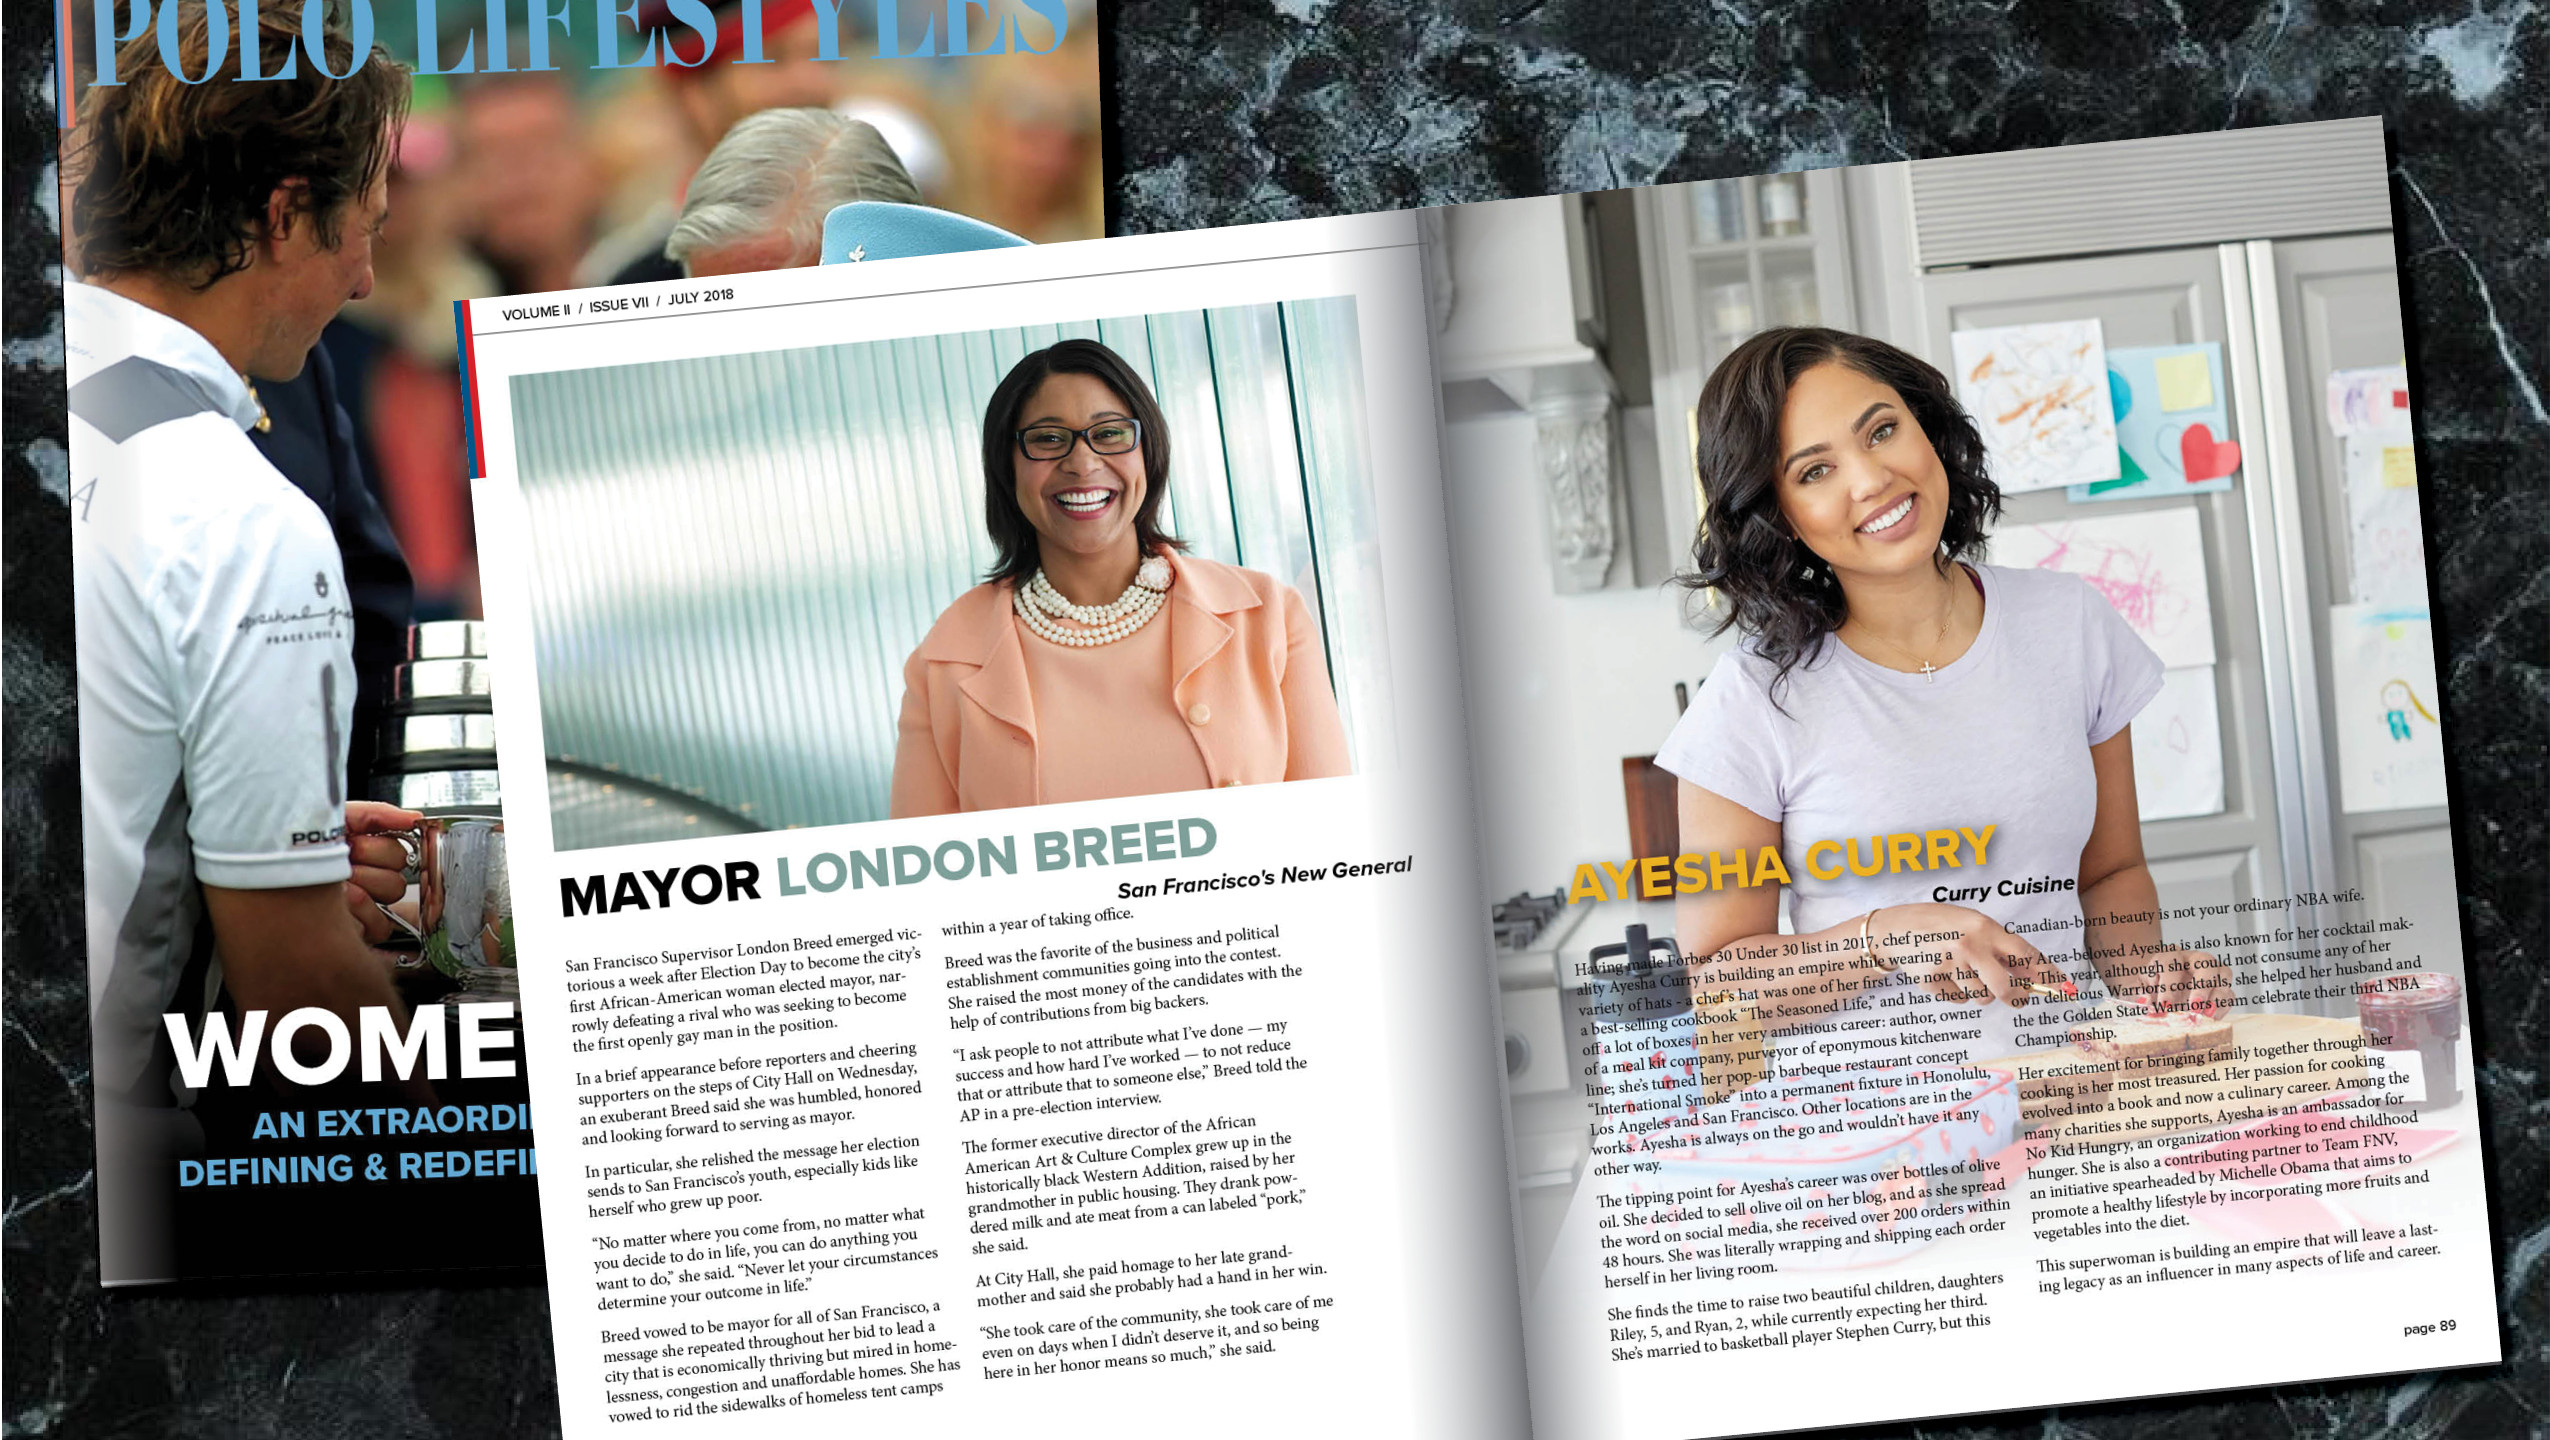 LONDON BREED & AYESHA CURRY